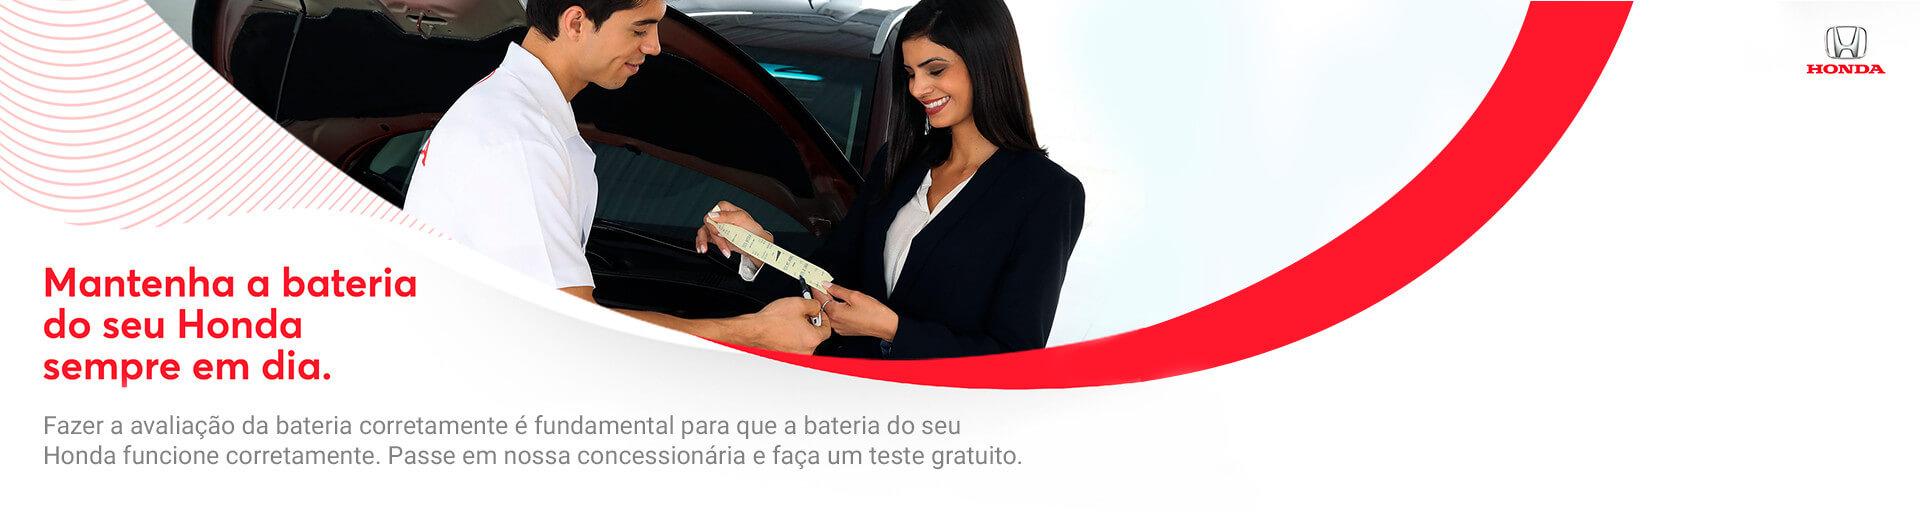 Campanha_Bateria